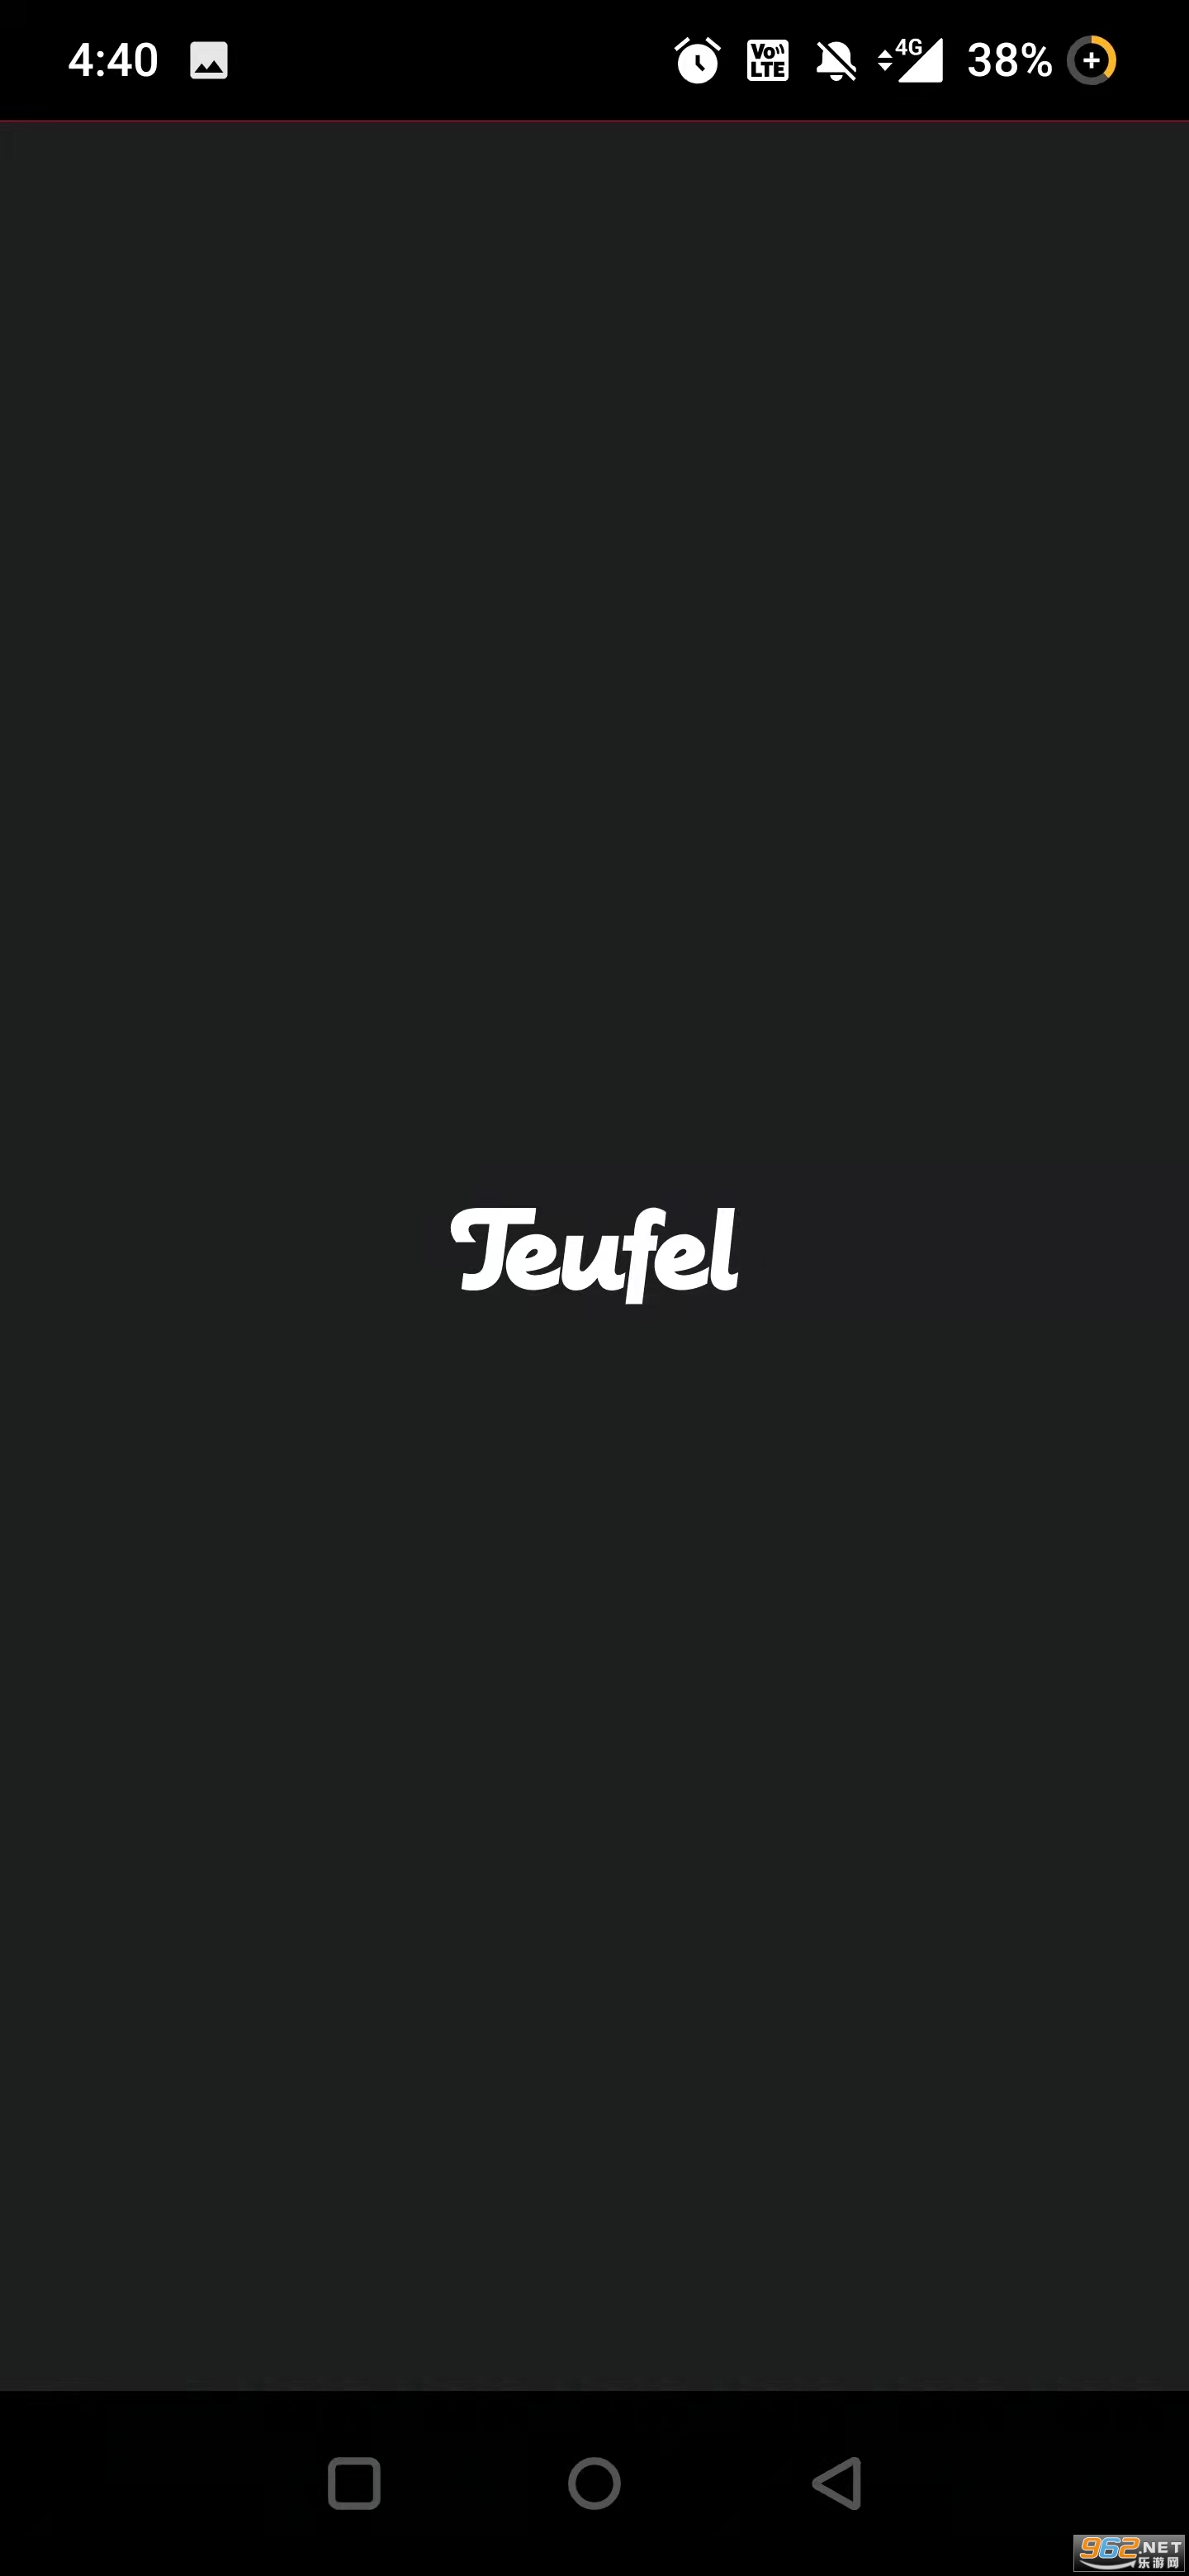 Teufel Headphones appv1.4.3安卓版截图0